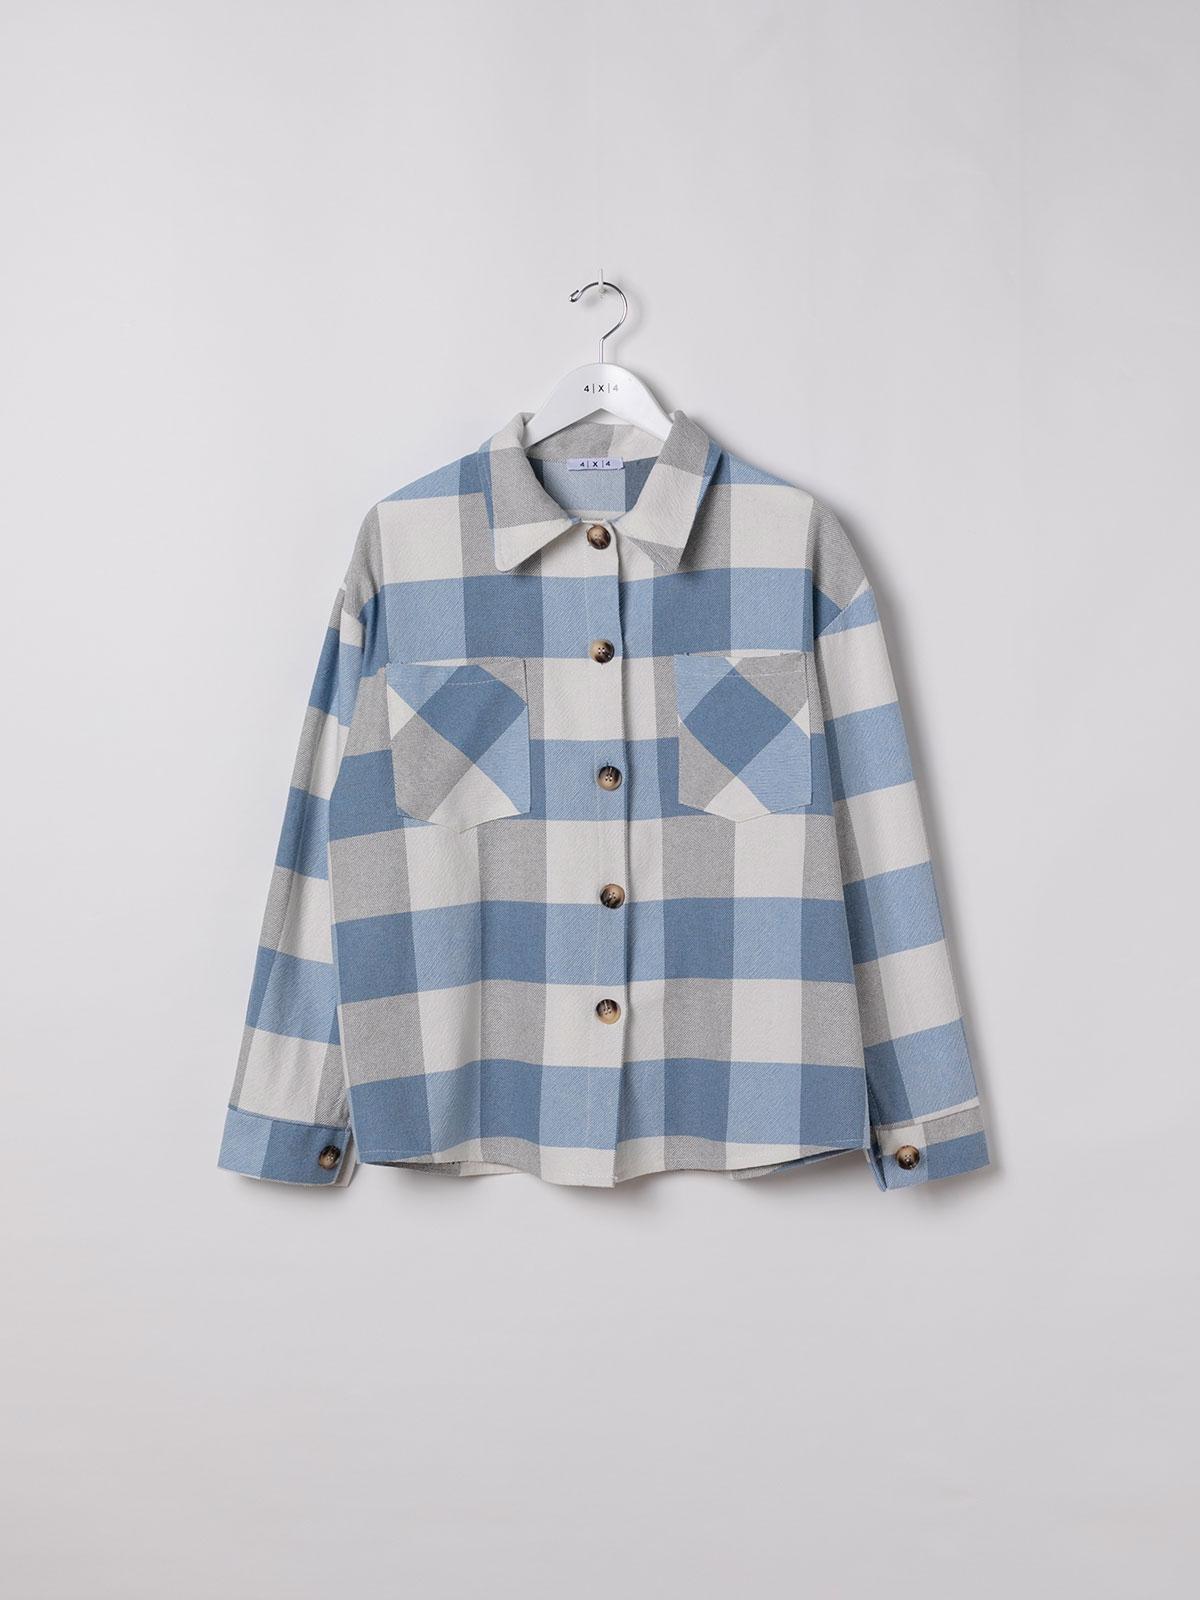 Camisa mujer cuadros 2 bolsillos algodón 100% Azul